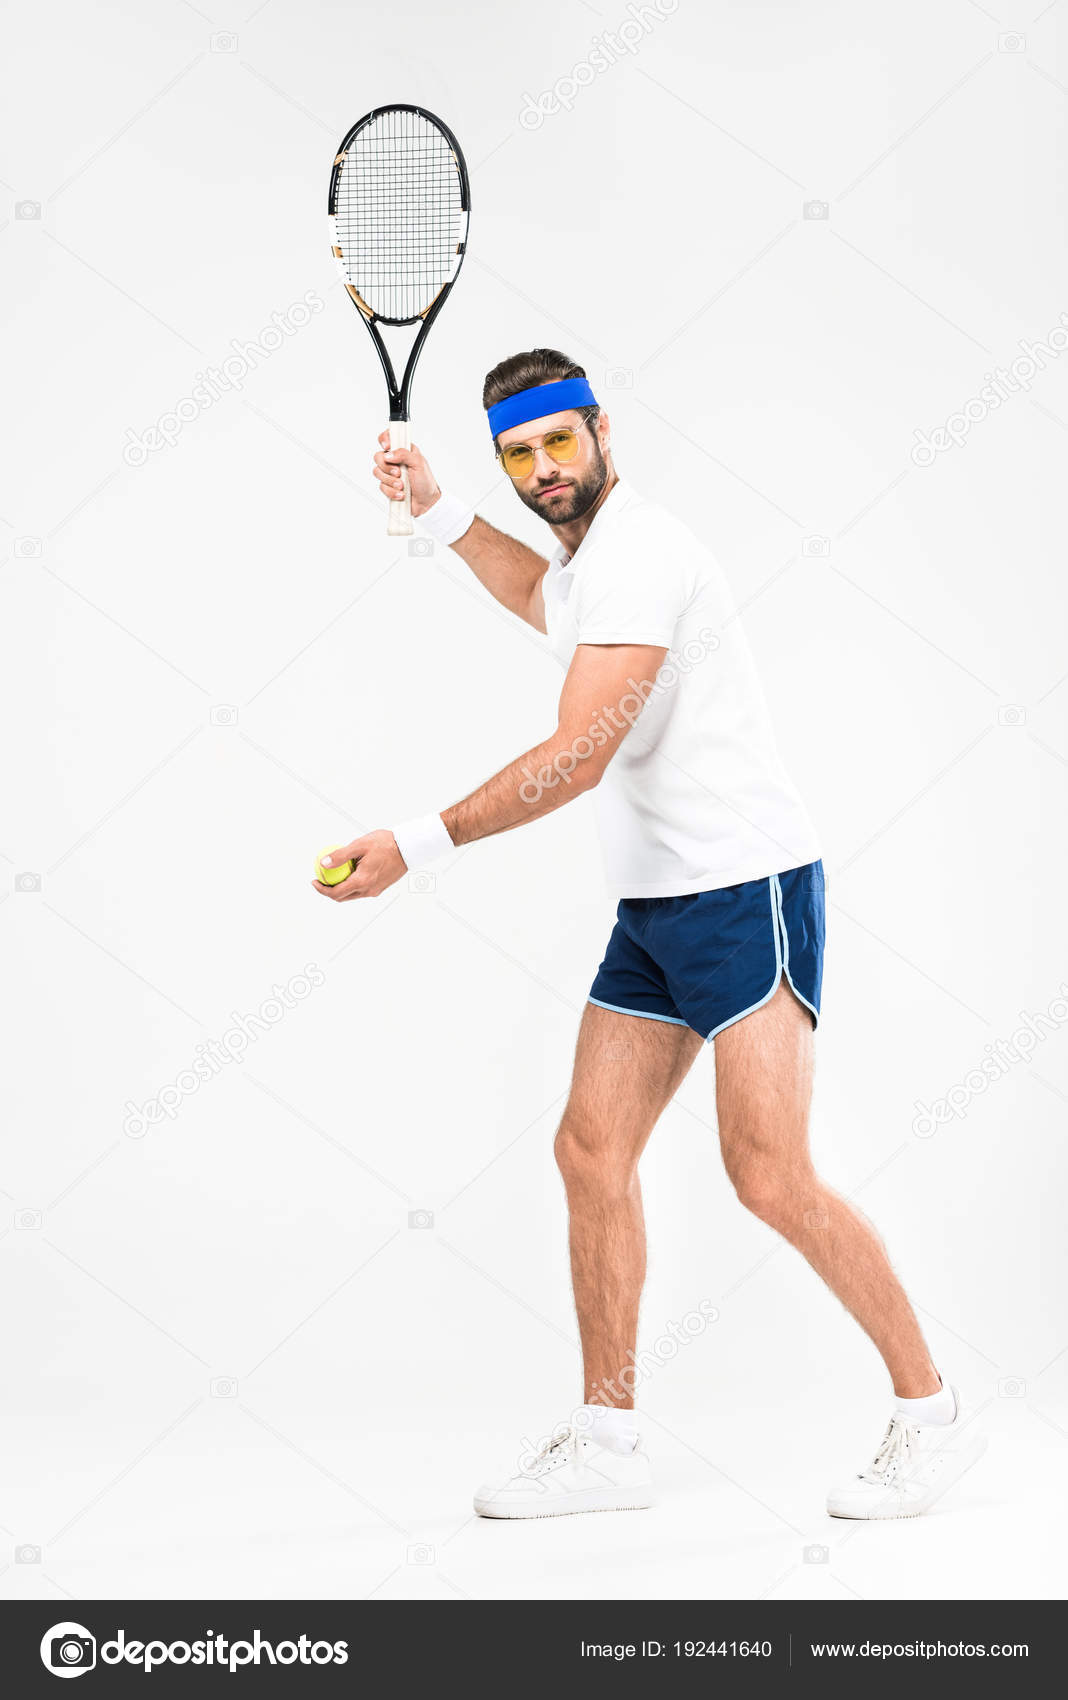 934c61373c5 Sportsman Retro Sunglasses Playing Tennis Racket Ball Isolated White —  Stock Photo